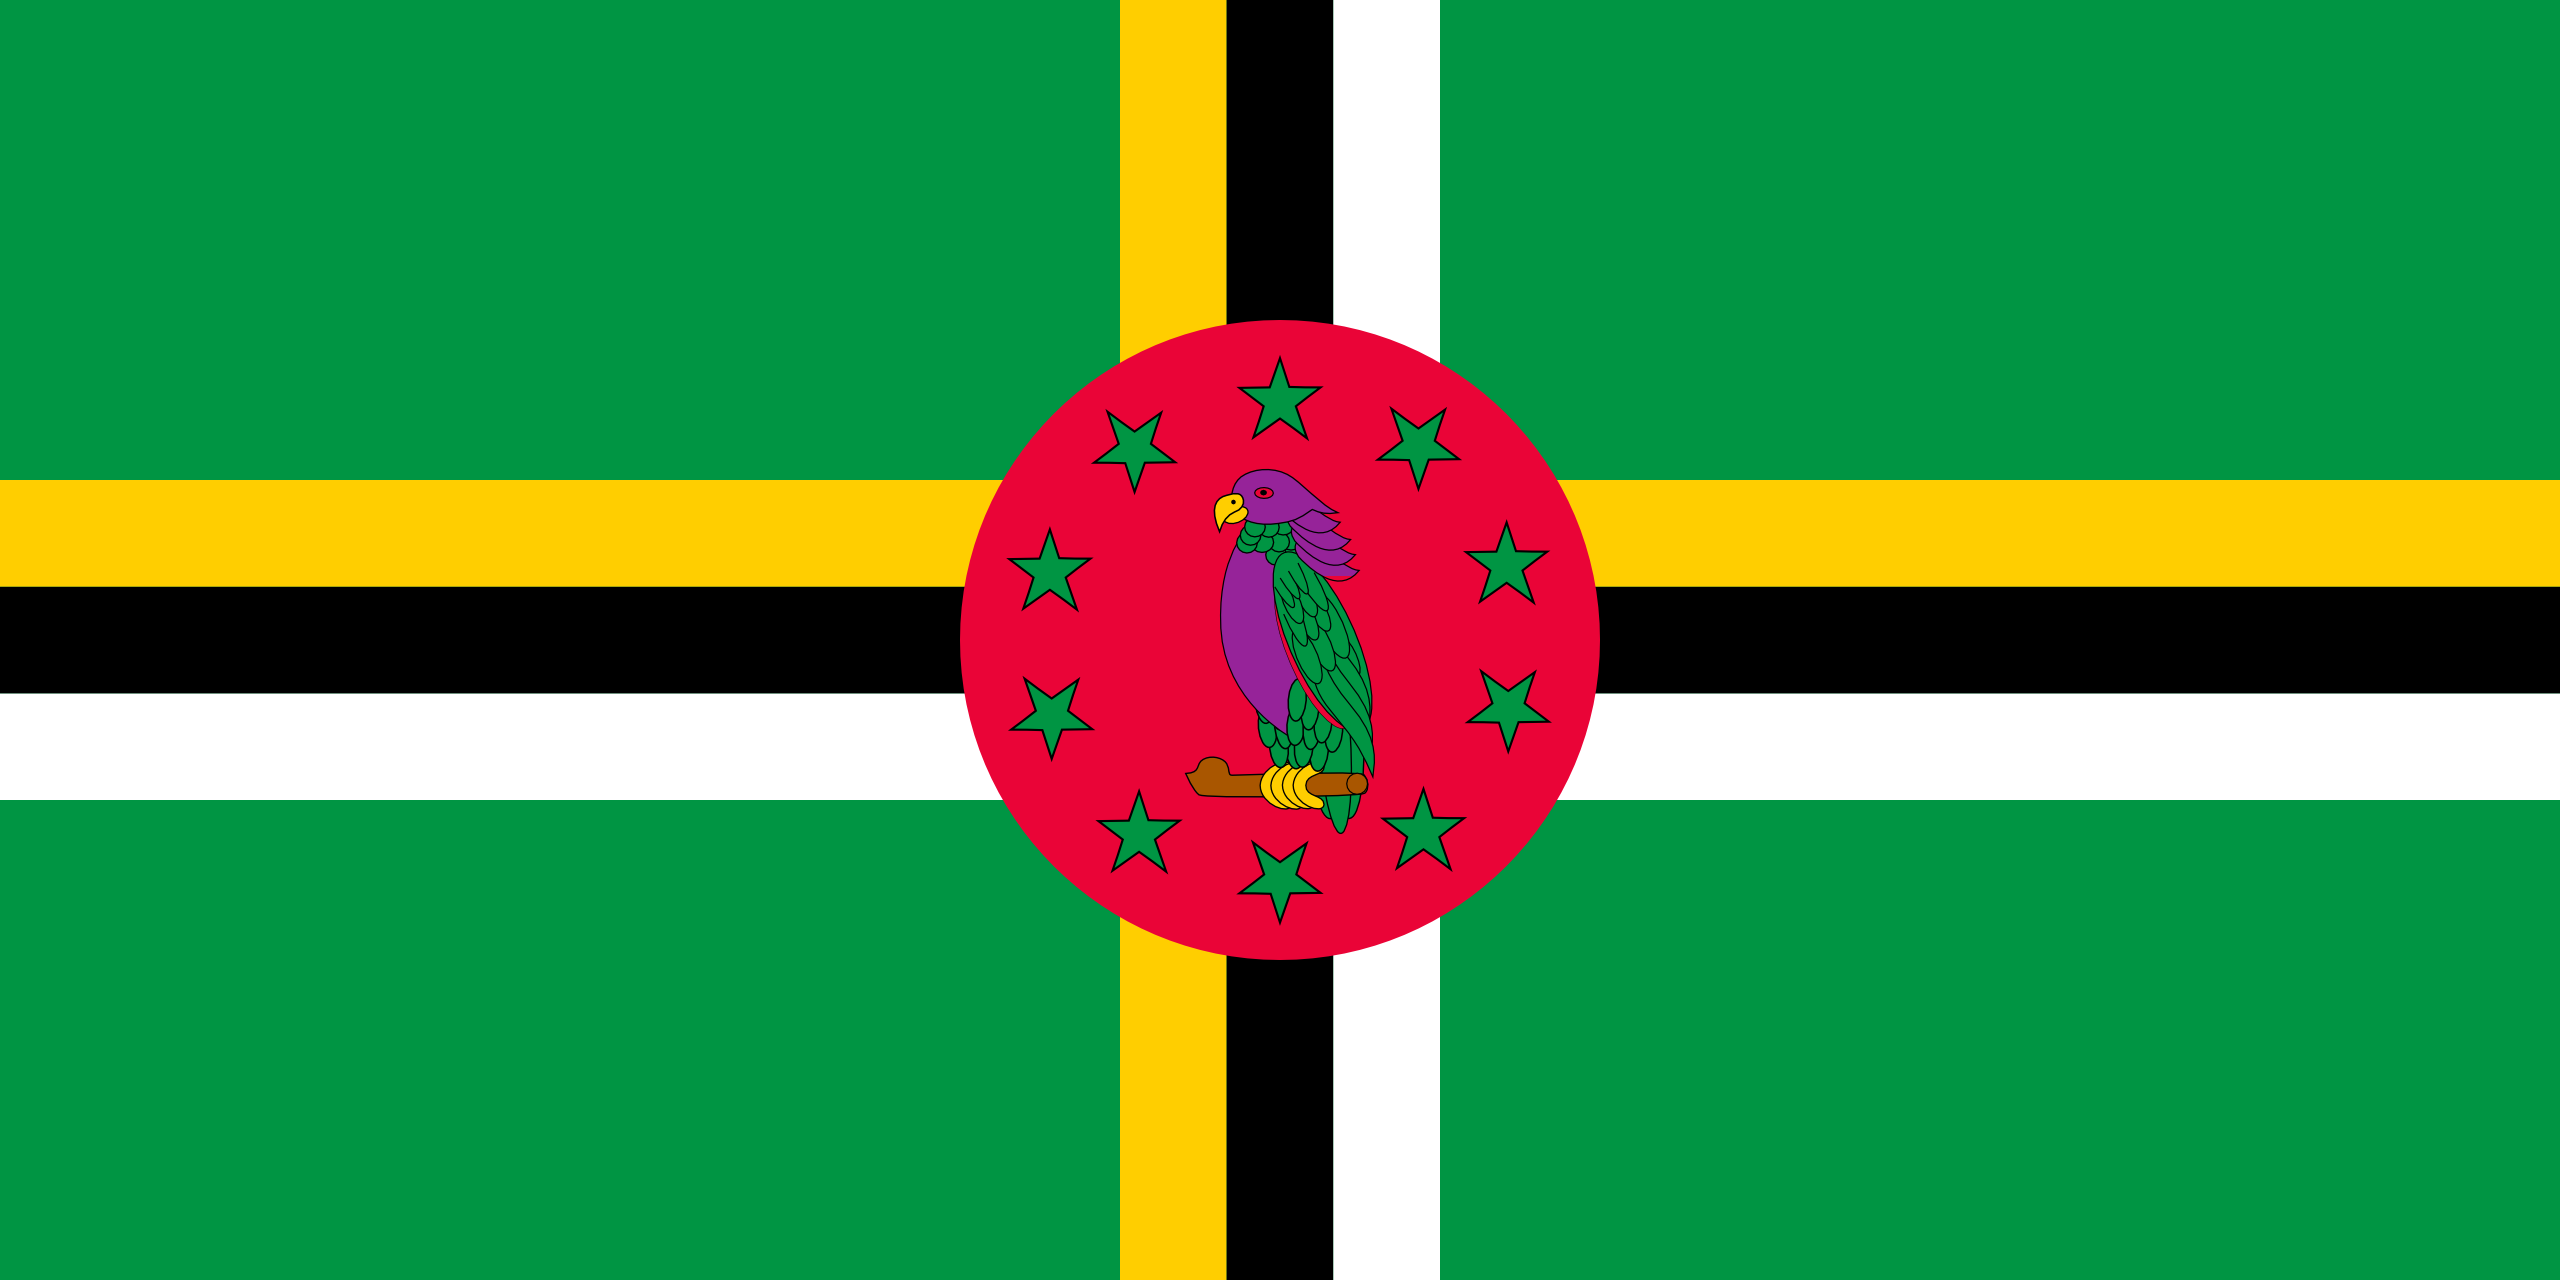 dominica, страна, Эмблема, логотип, символ - Обои HD - Профессор falken.com